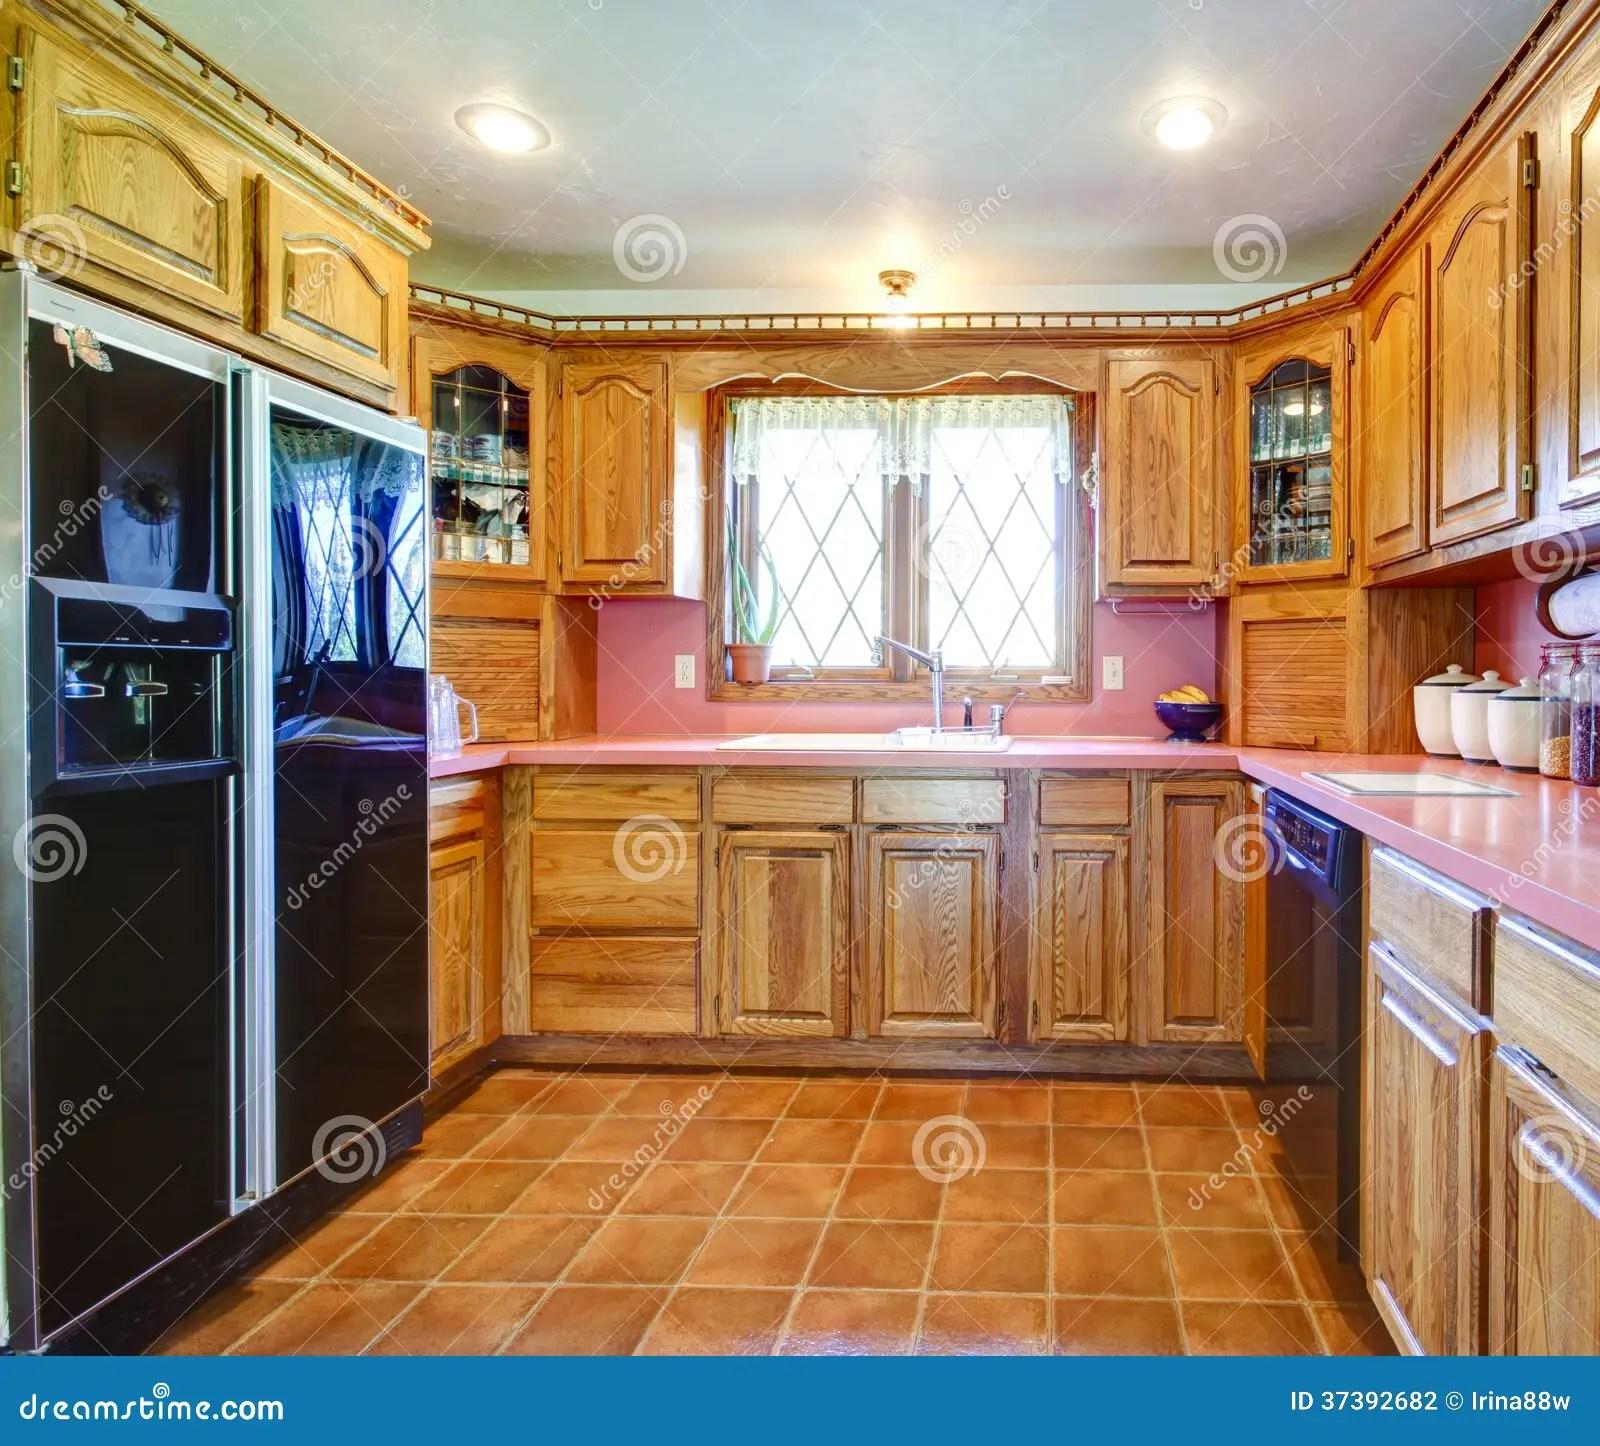 kitchen sink farmhouse appliance covers 农舍有木内阁和桃红色backsplash的厨房室库存照片 图片包括有样式 瓦片 农舍有木内阁和桃红色backsplash的厨房室